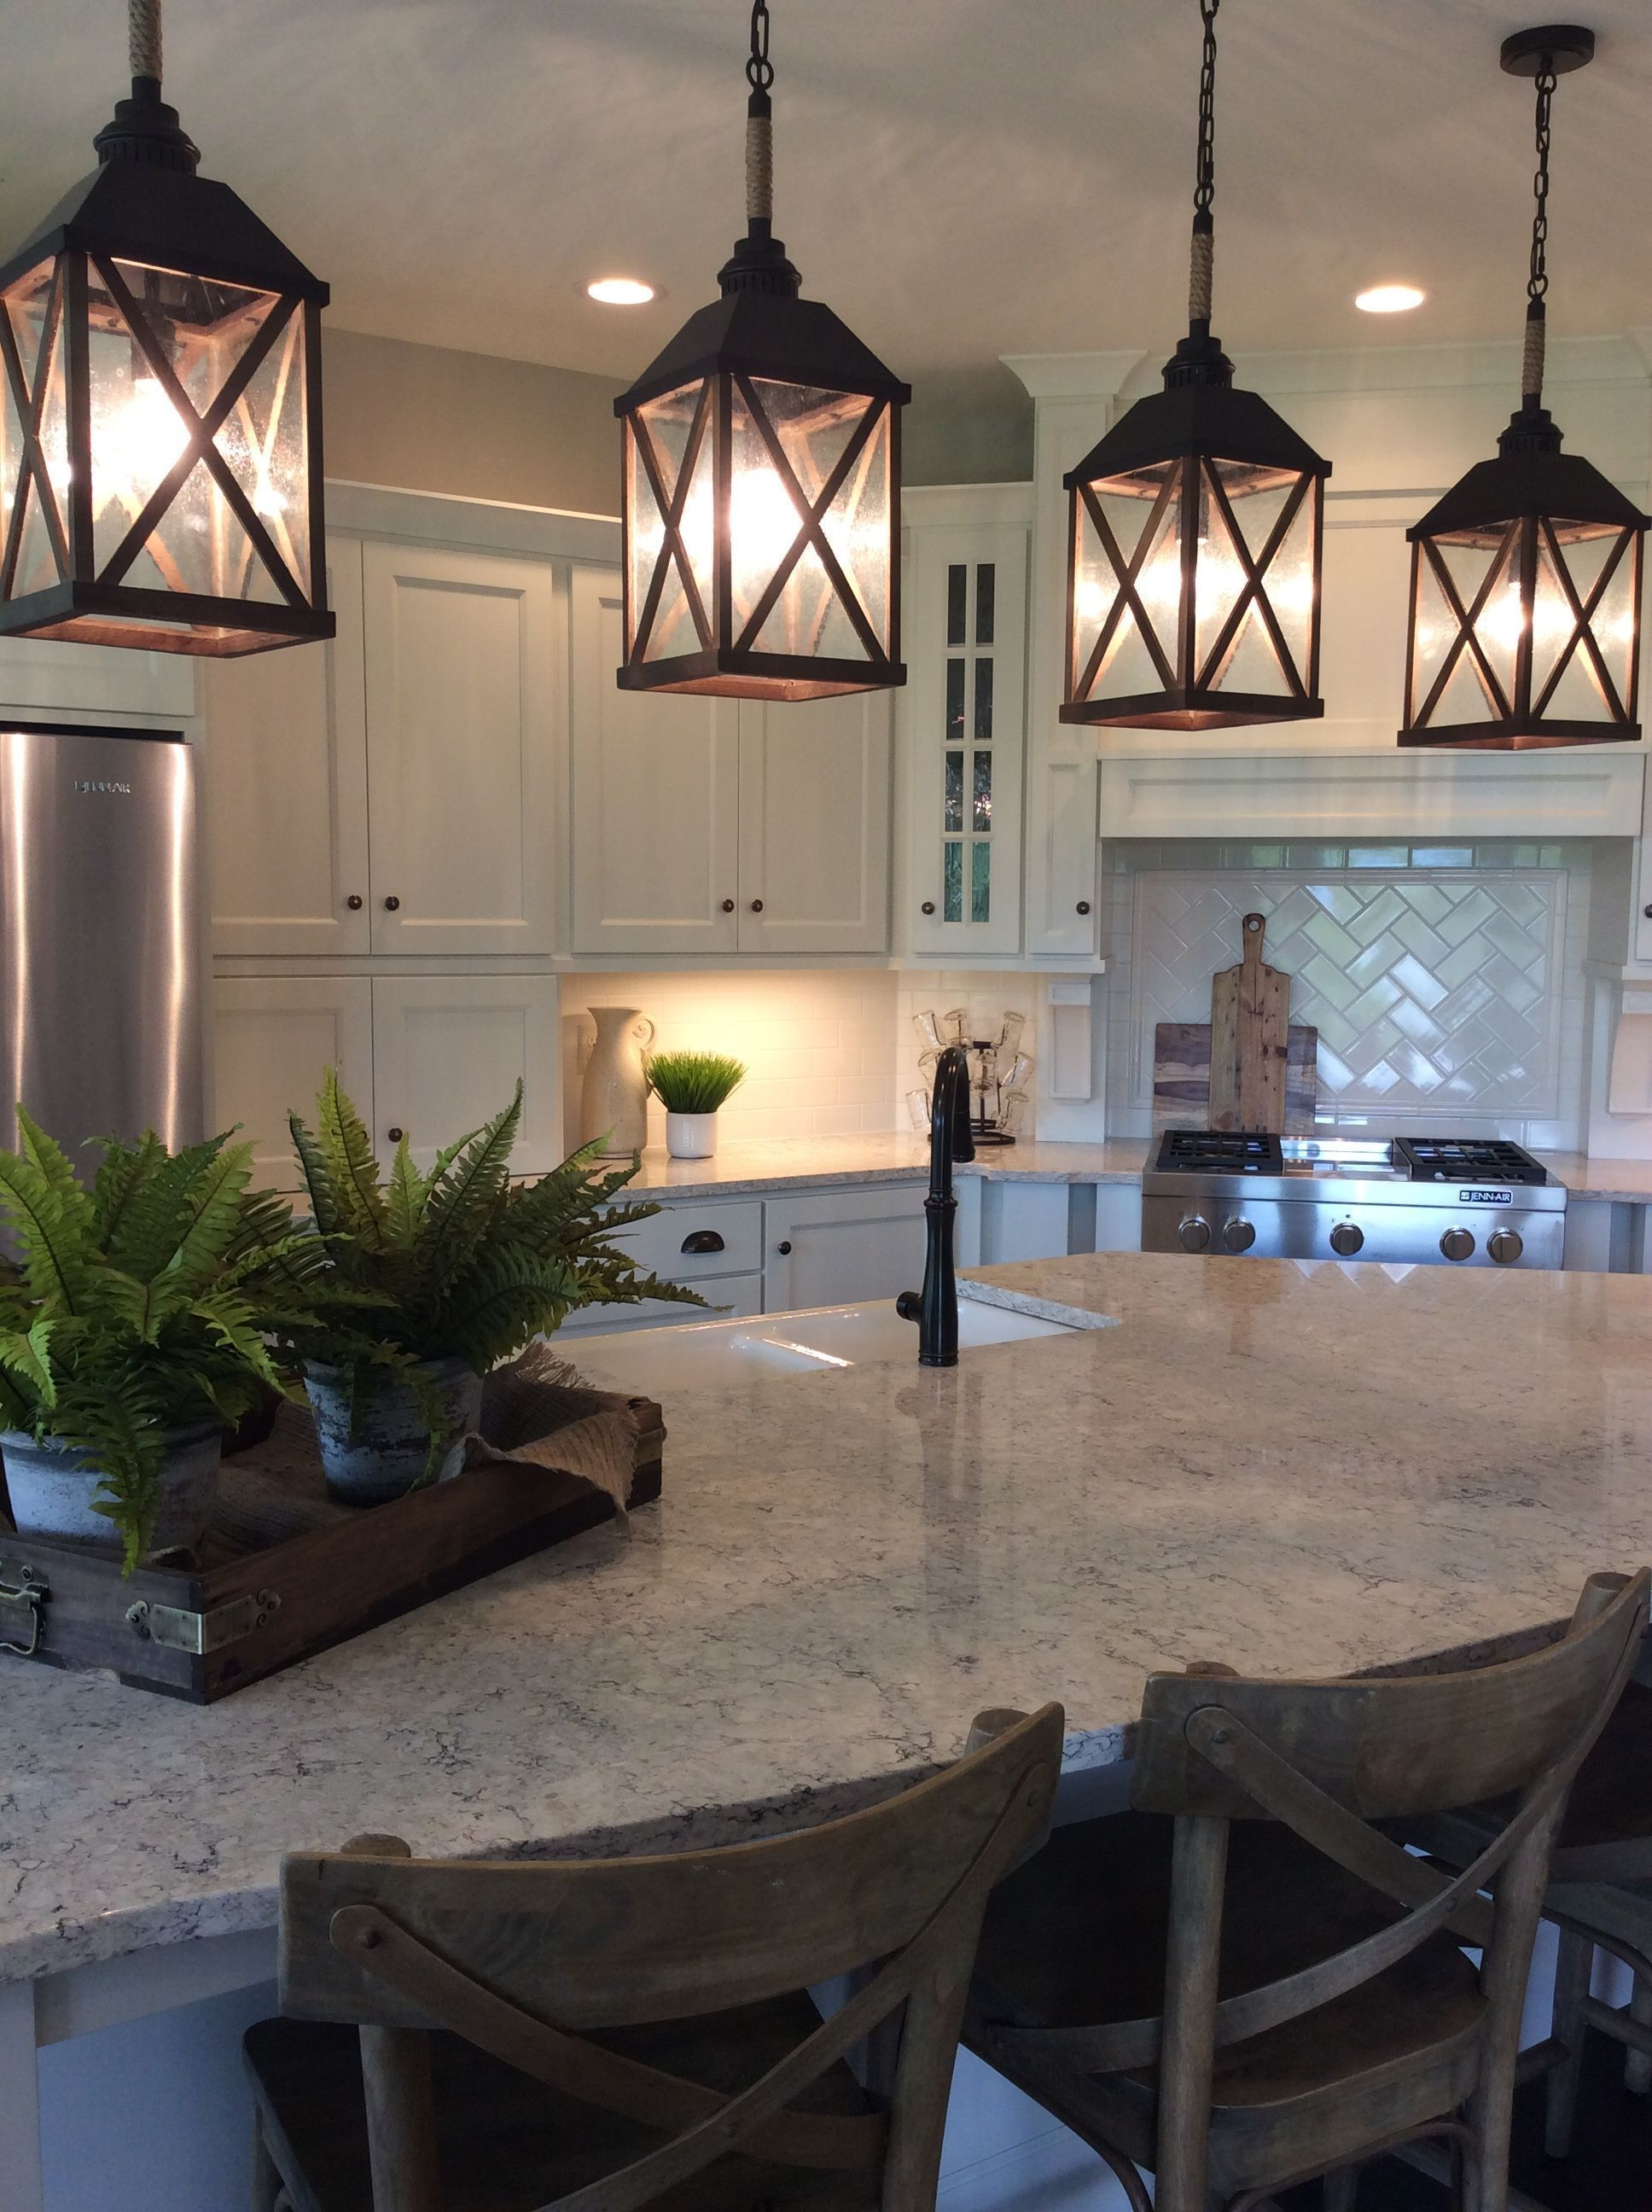 7 Best Dining Room Lighting Ideas